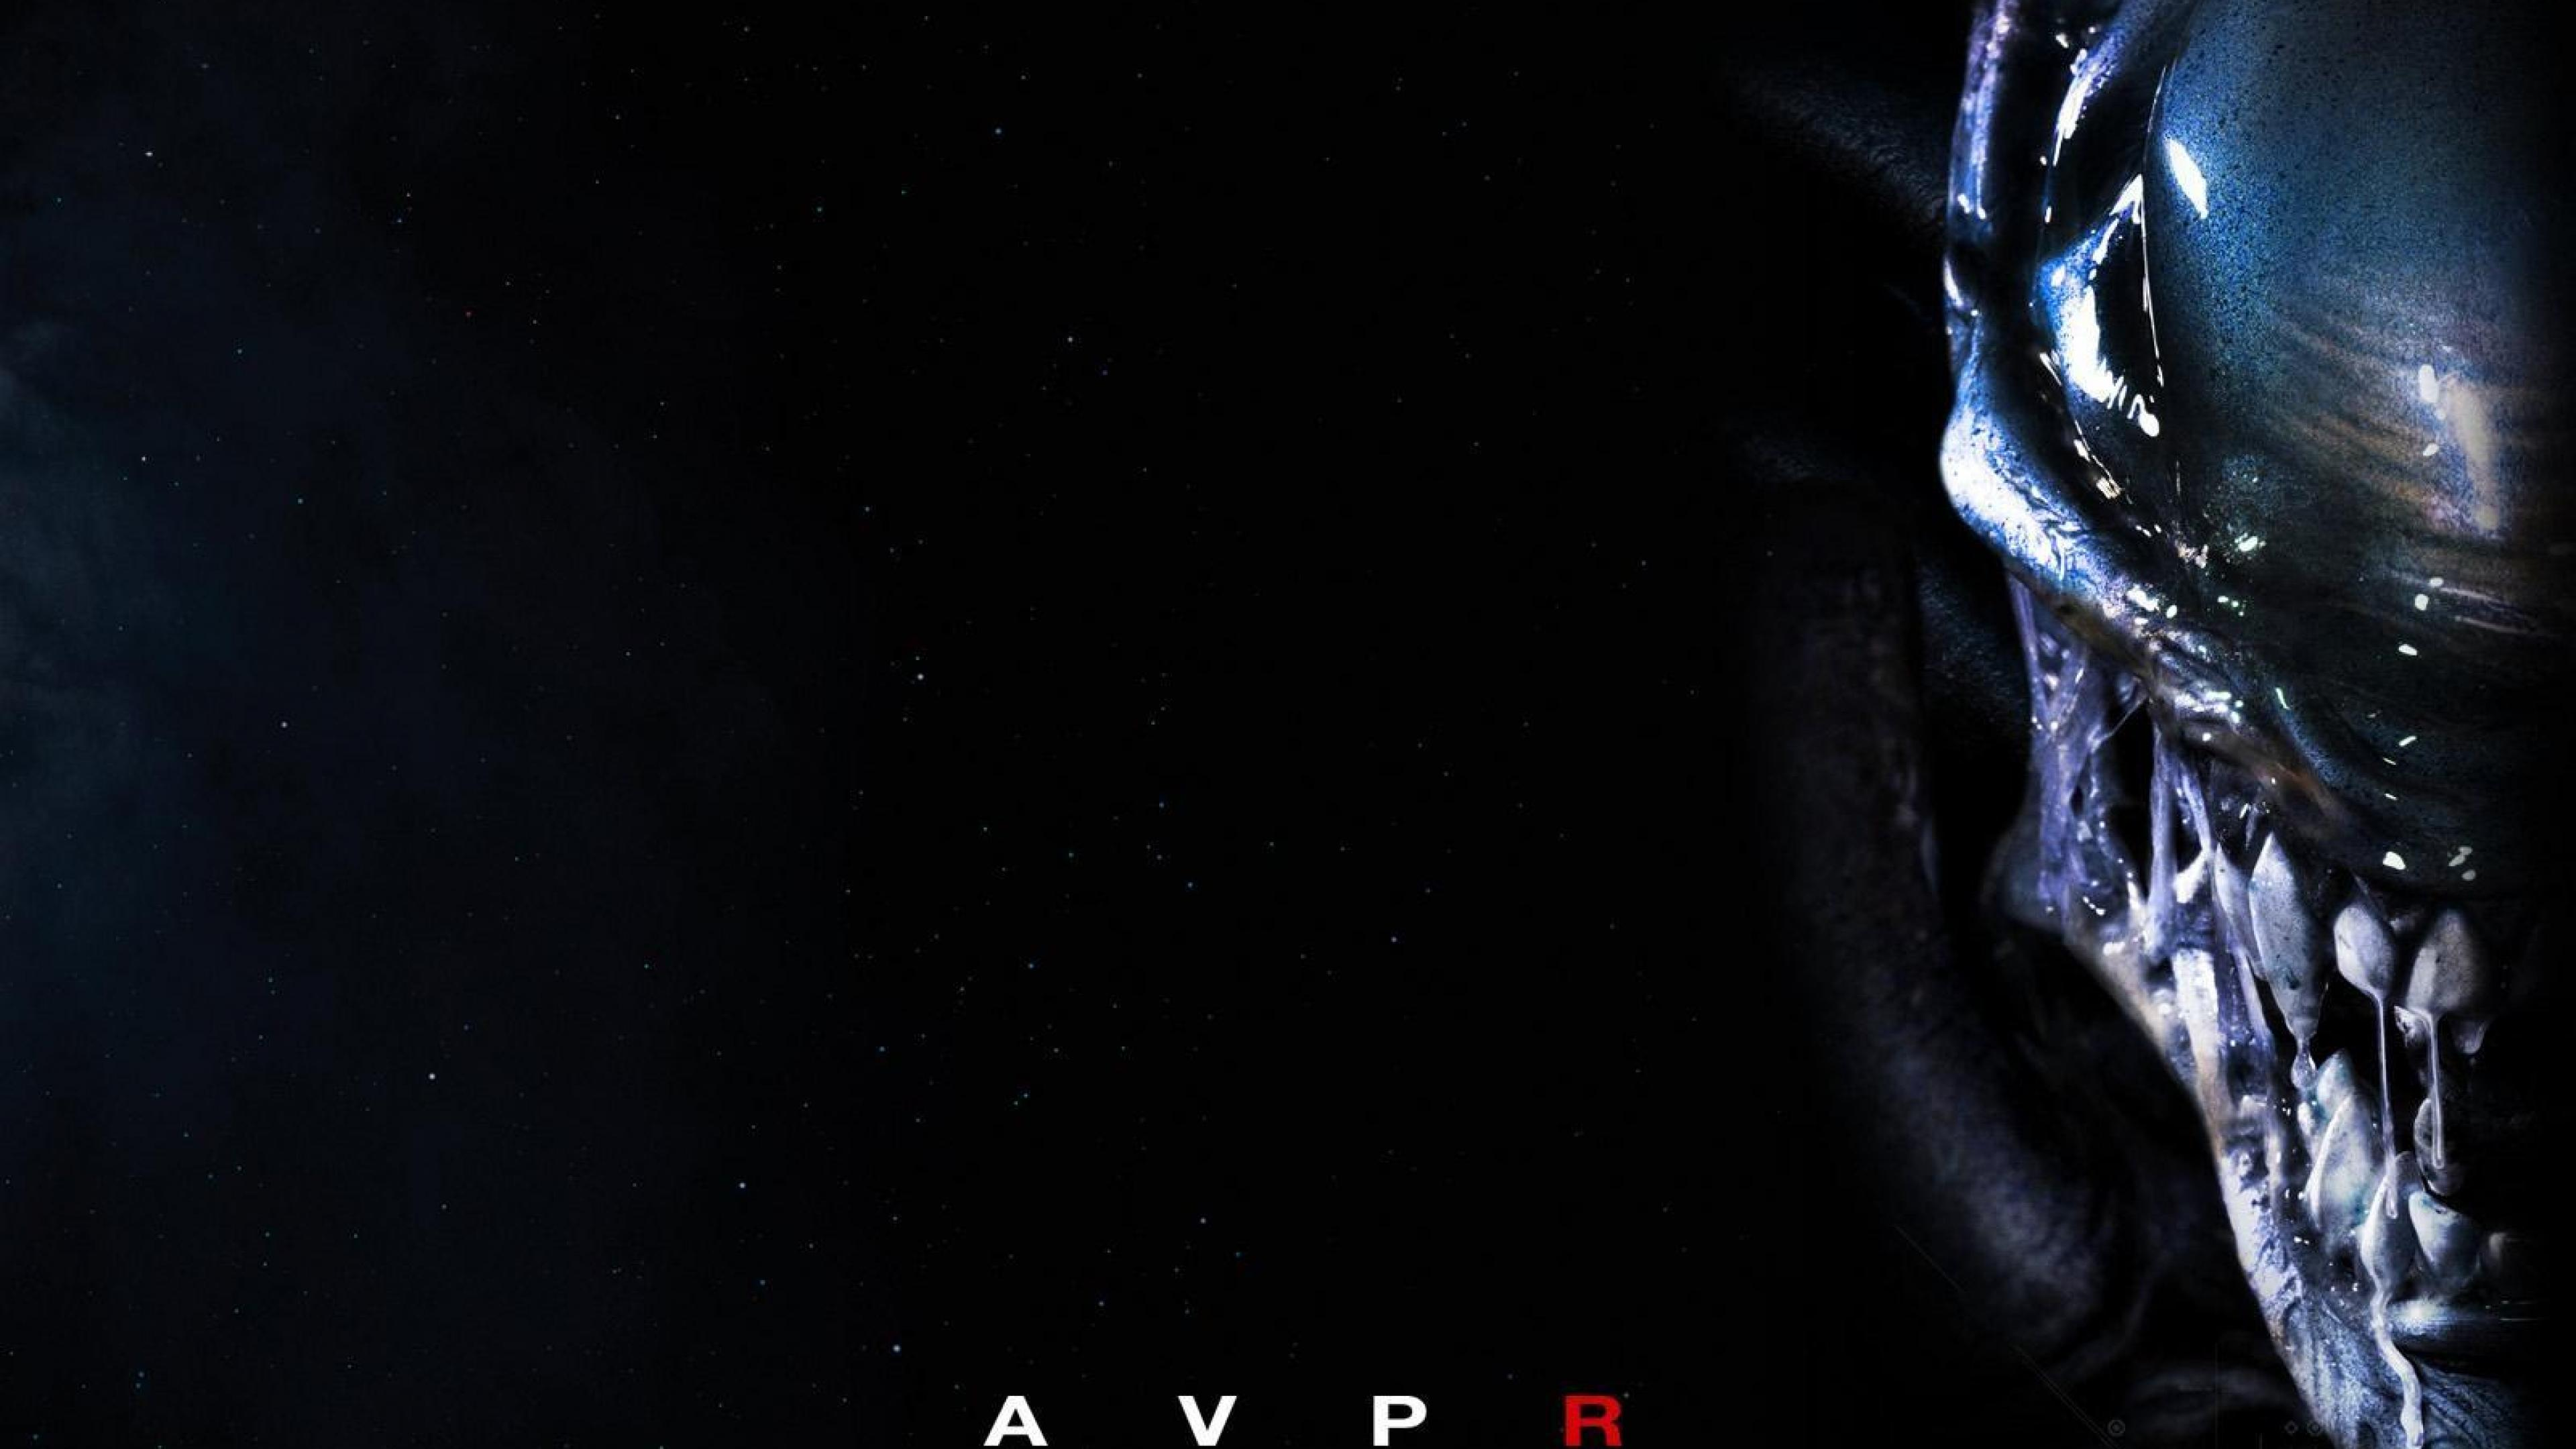 Alien Vs Predator Hd Wallpapers: Alien Vs Predator Wallpaper